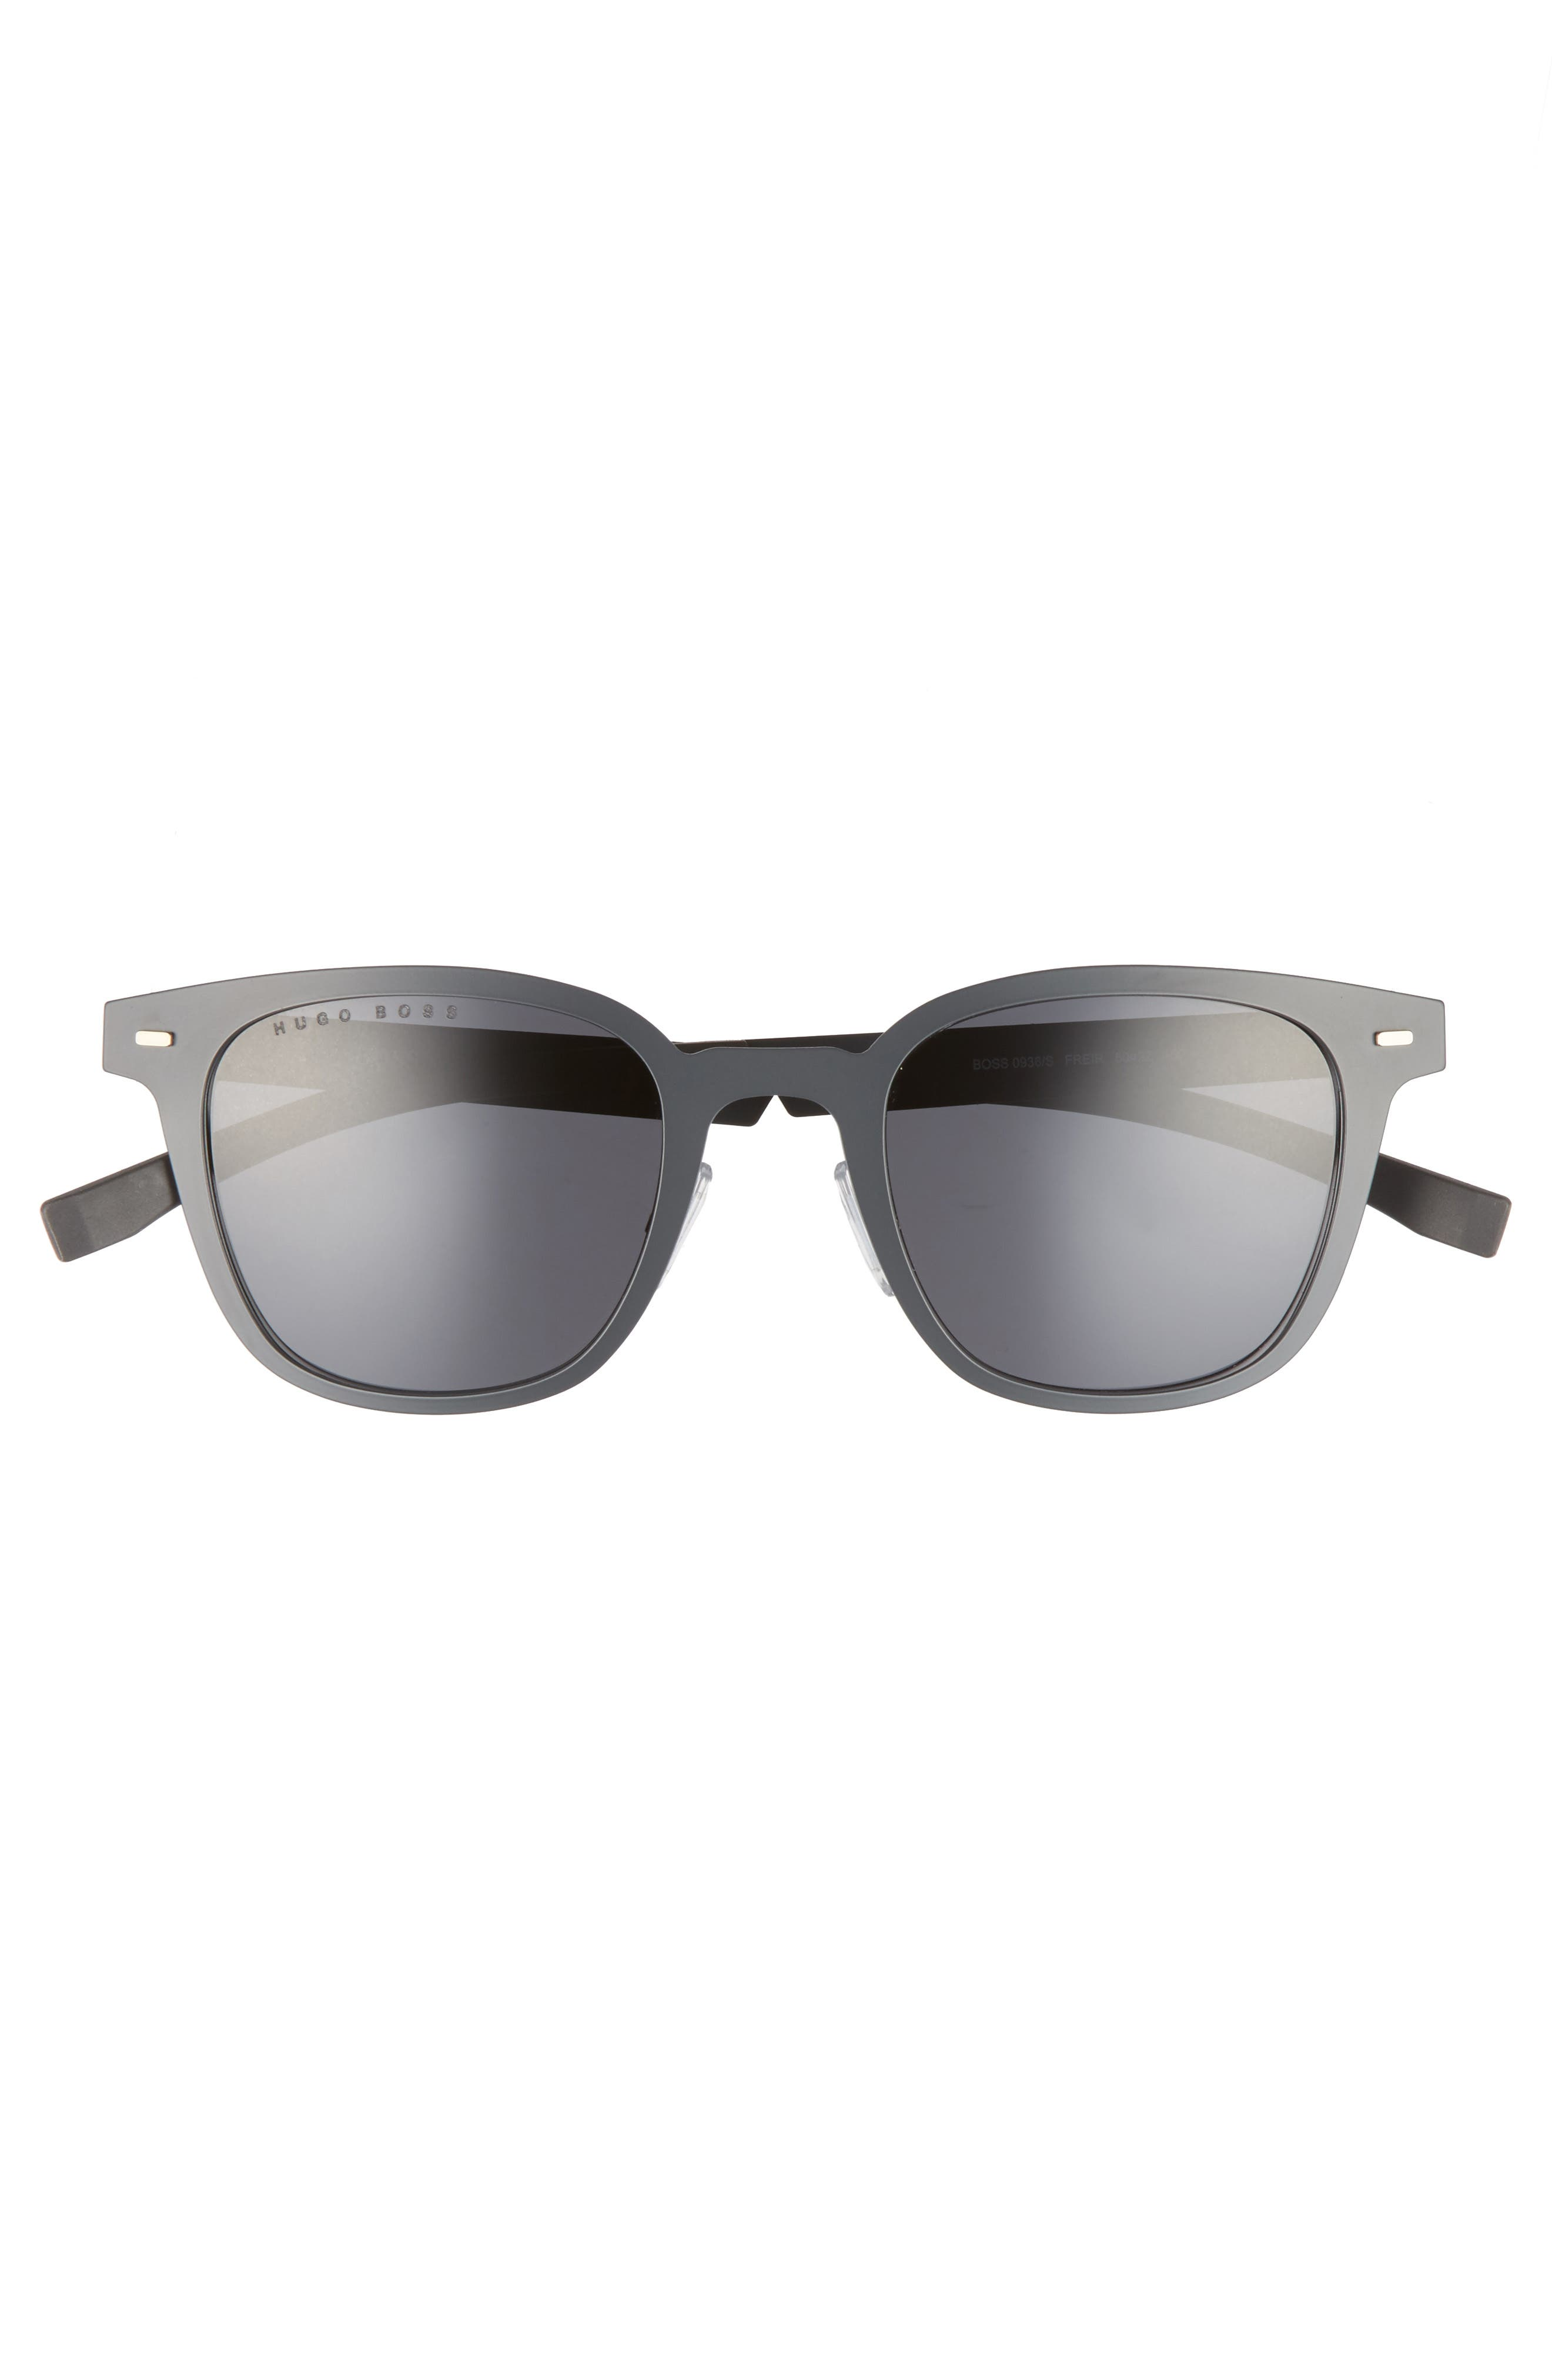 50mm Sunglasses,                             Alternate thumbnail 2, color,                             Matte Gray/ Gray Blue